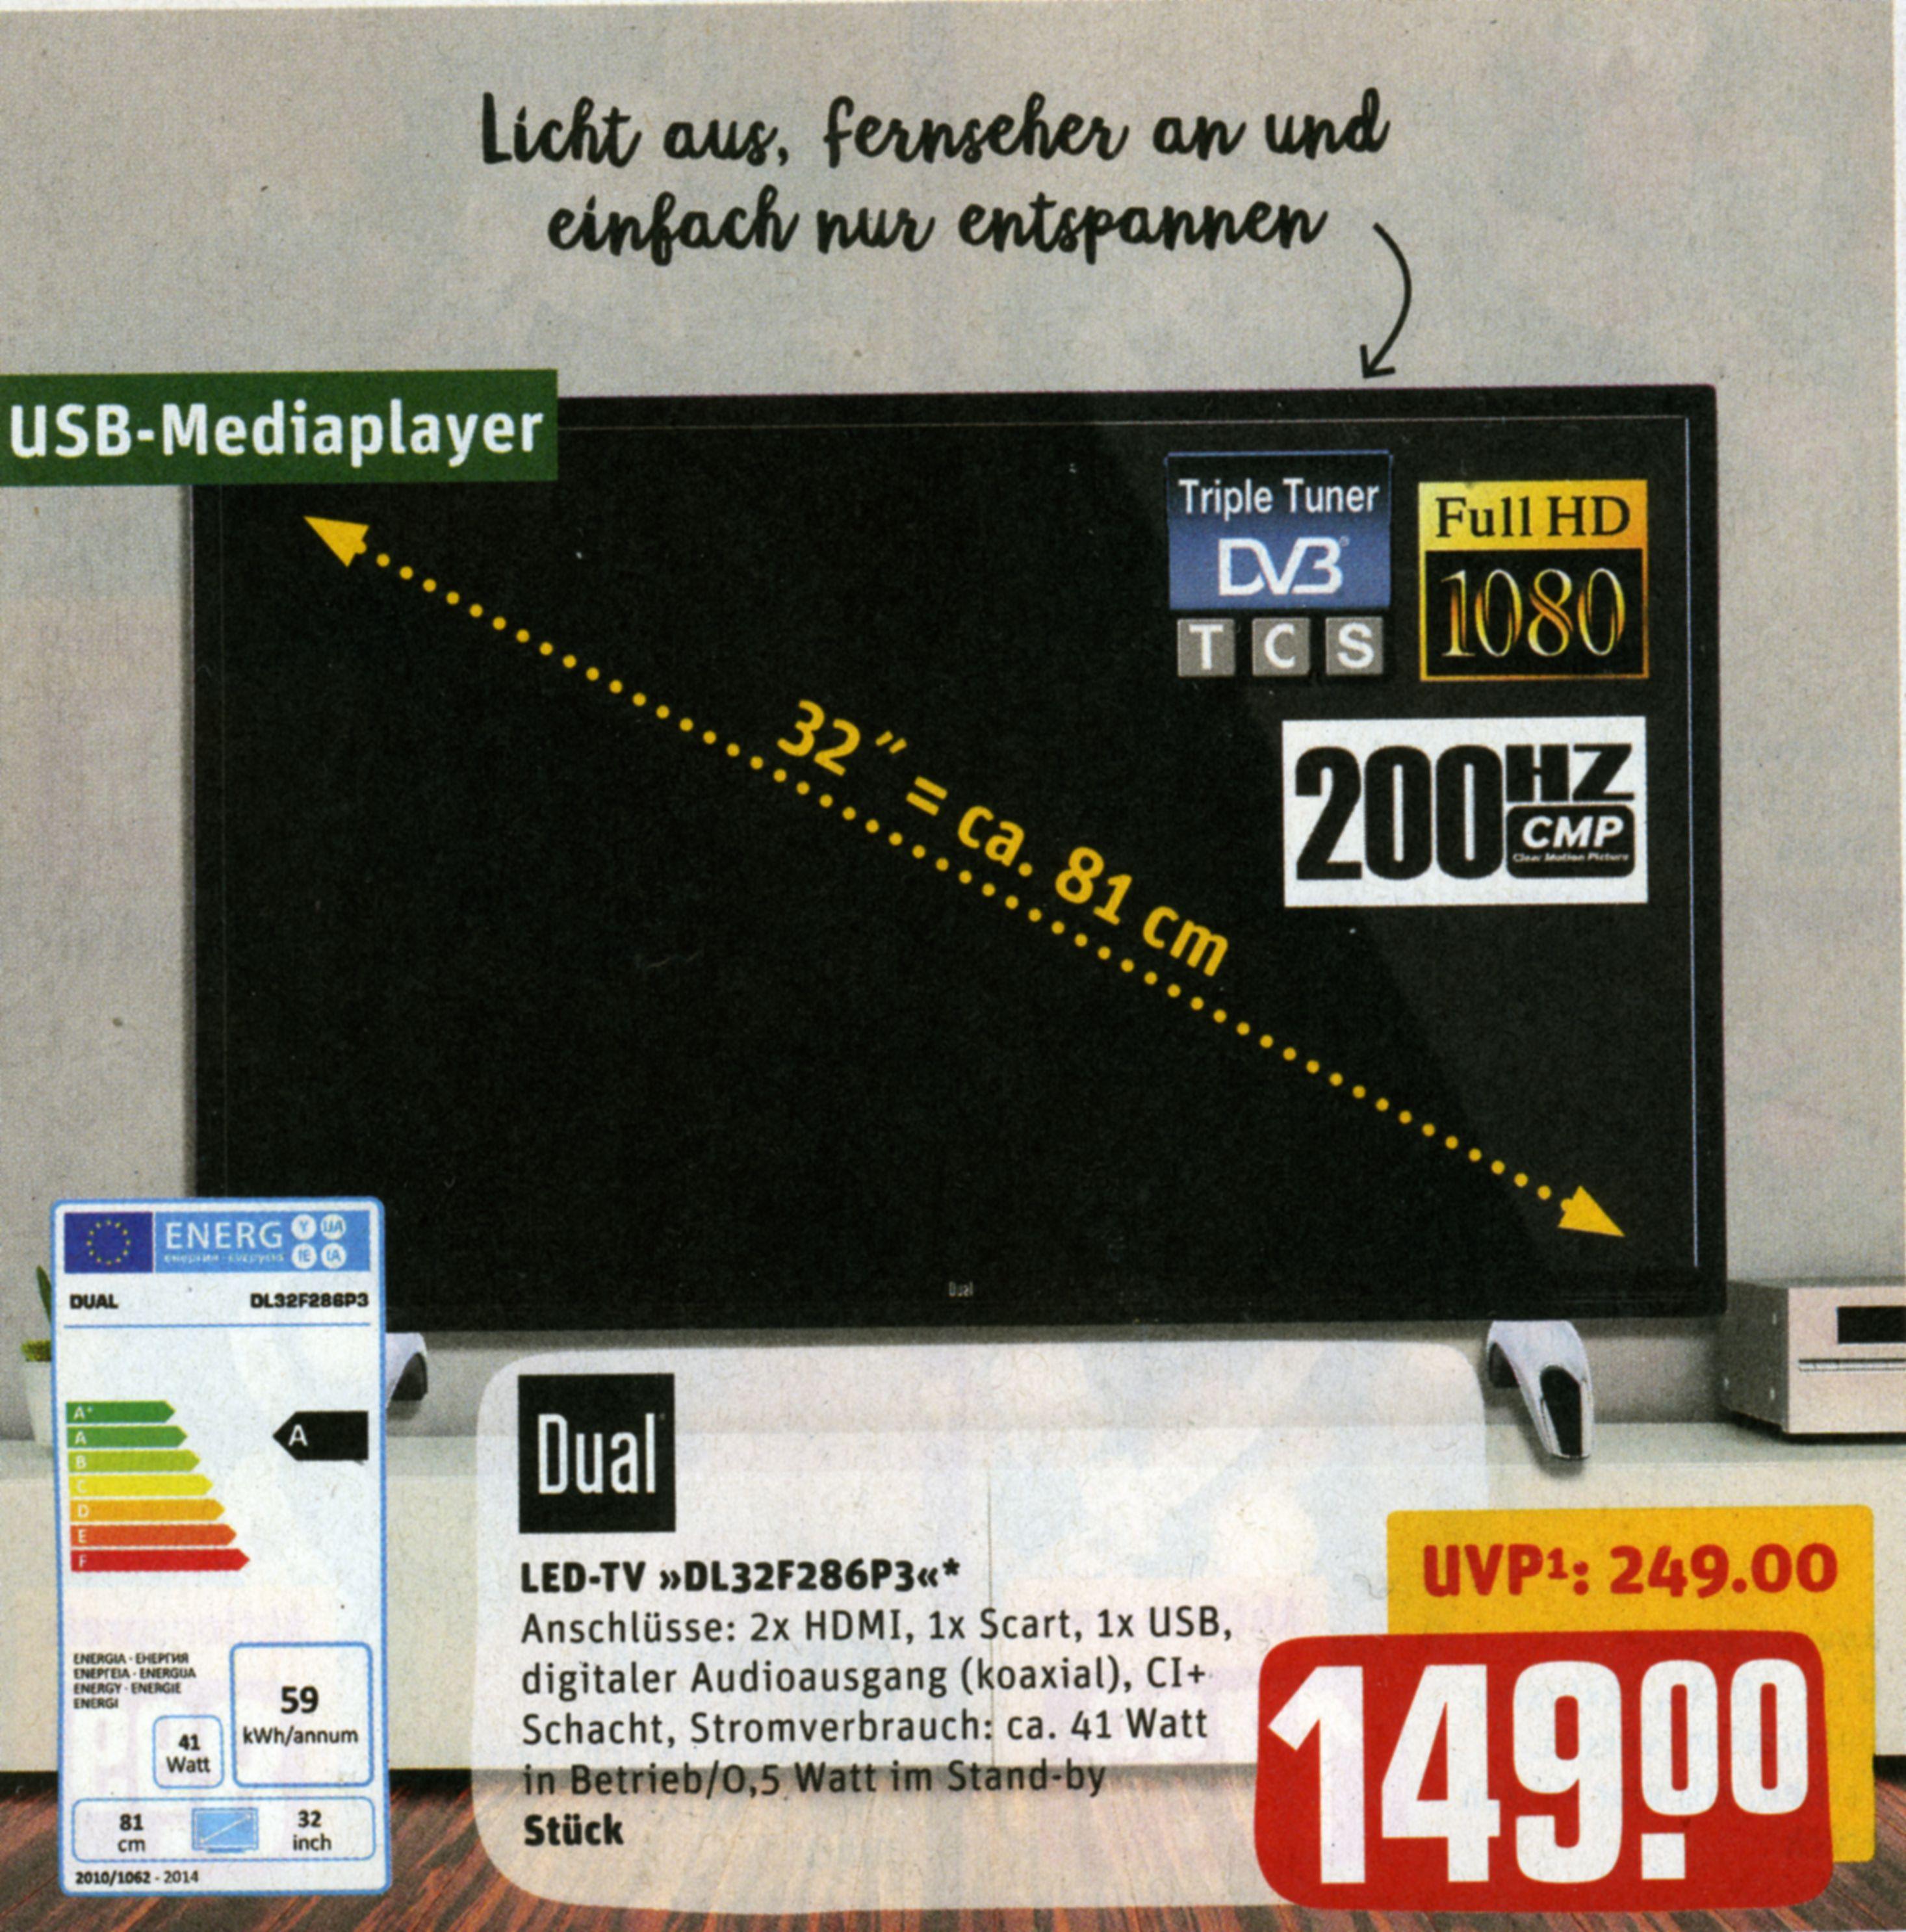 "32 "" LED Full HD Fernseher bei REWE ab 21.11.2016 für 149 Euro"